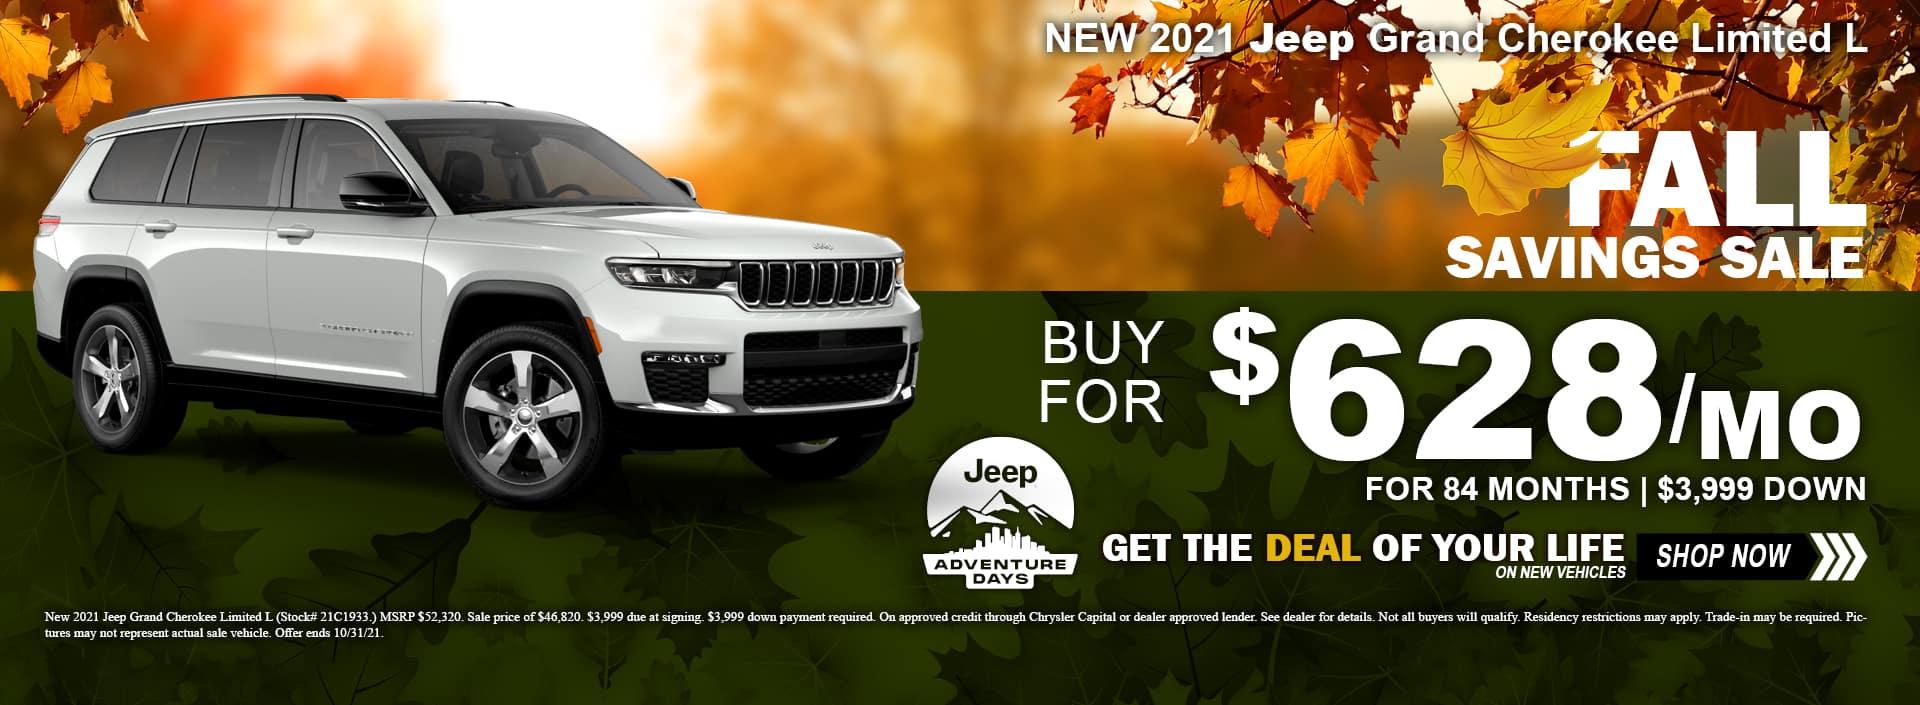 Jeep Grand Cherokee Fall Savings